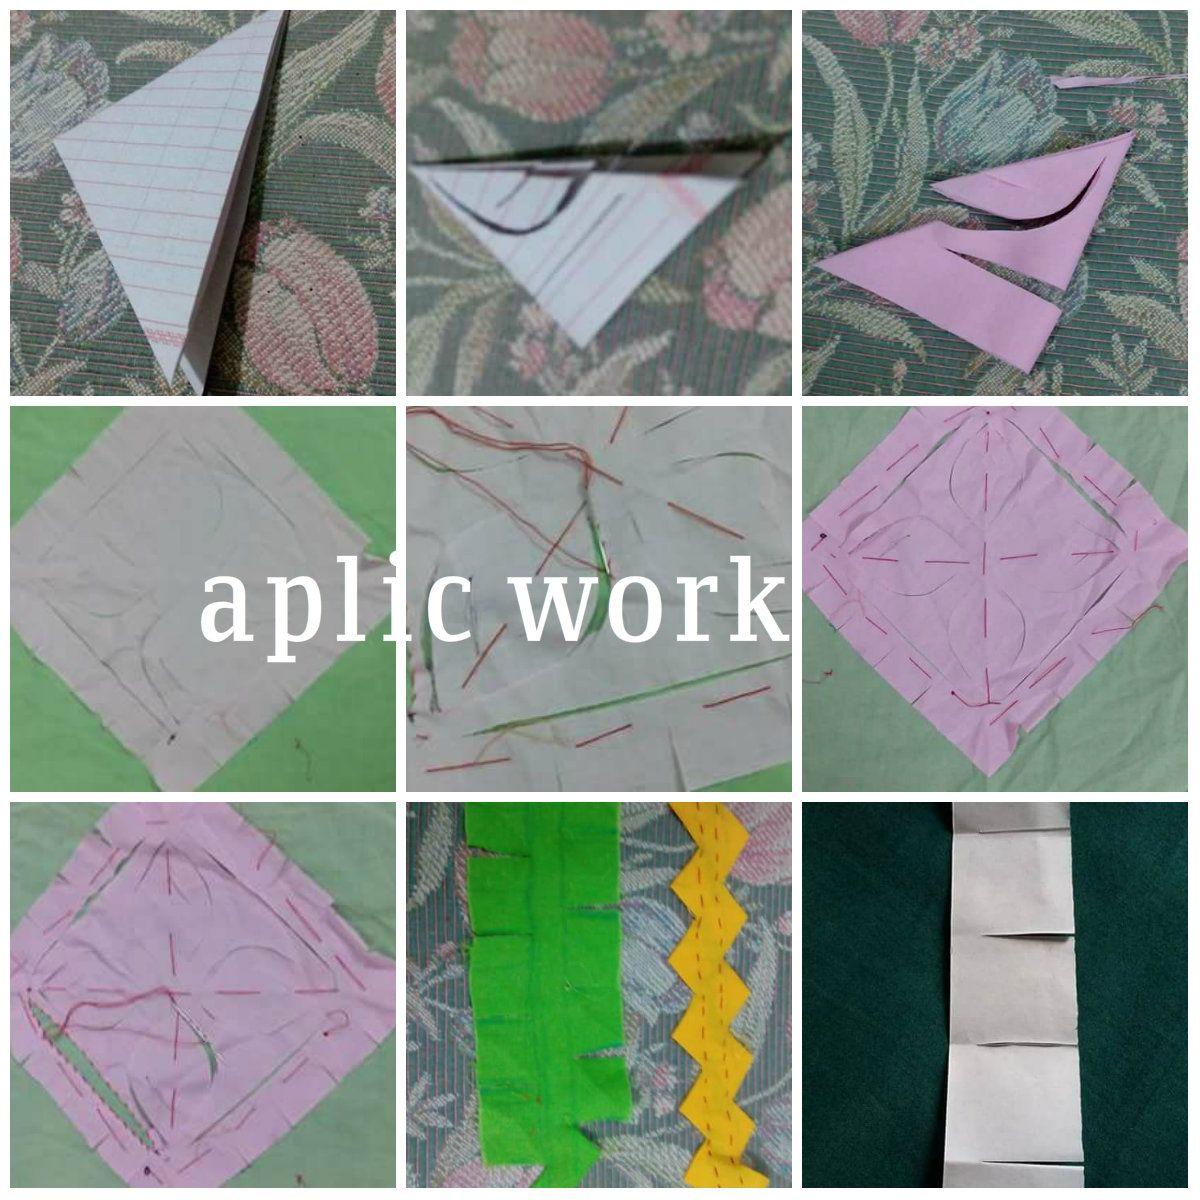 aplic work | Aplic work: Rilli Work | Pinterest